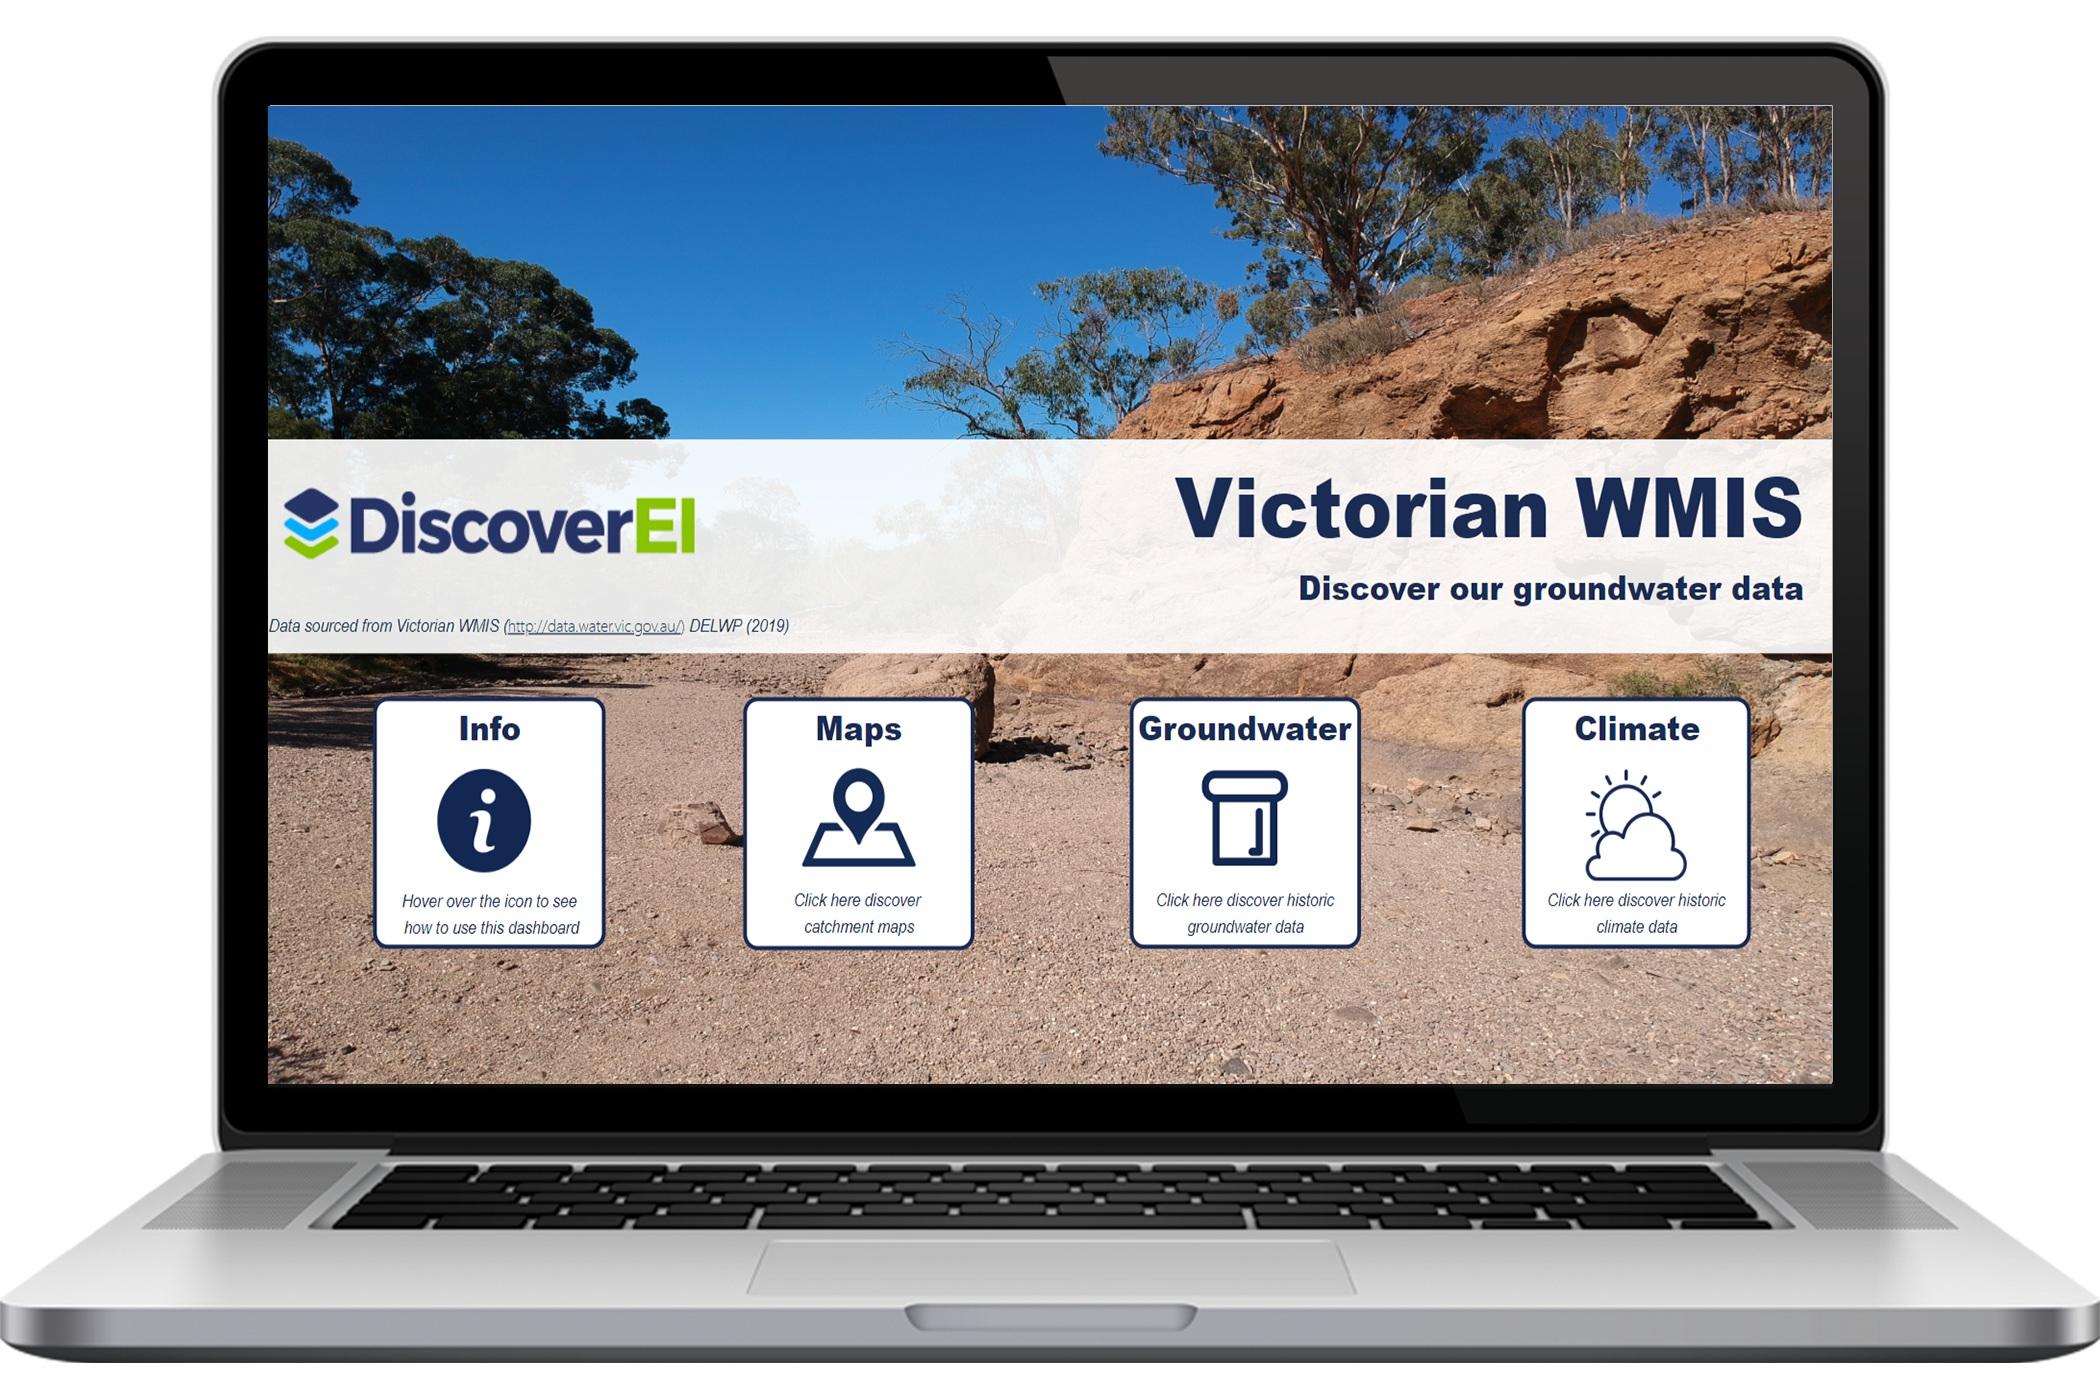 DiscoverEI Victorian WMIS Dashboard